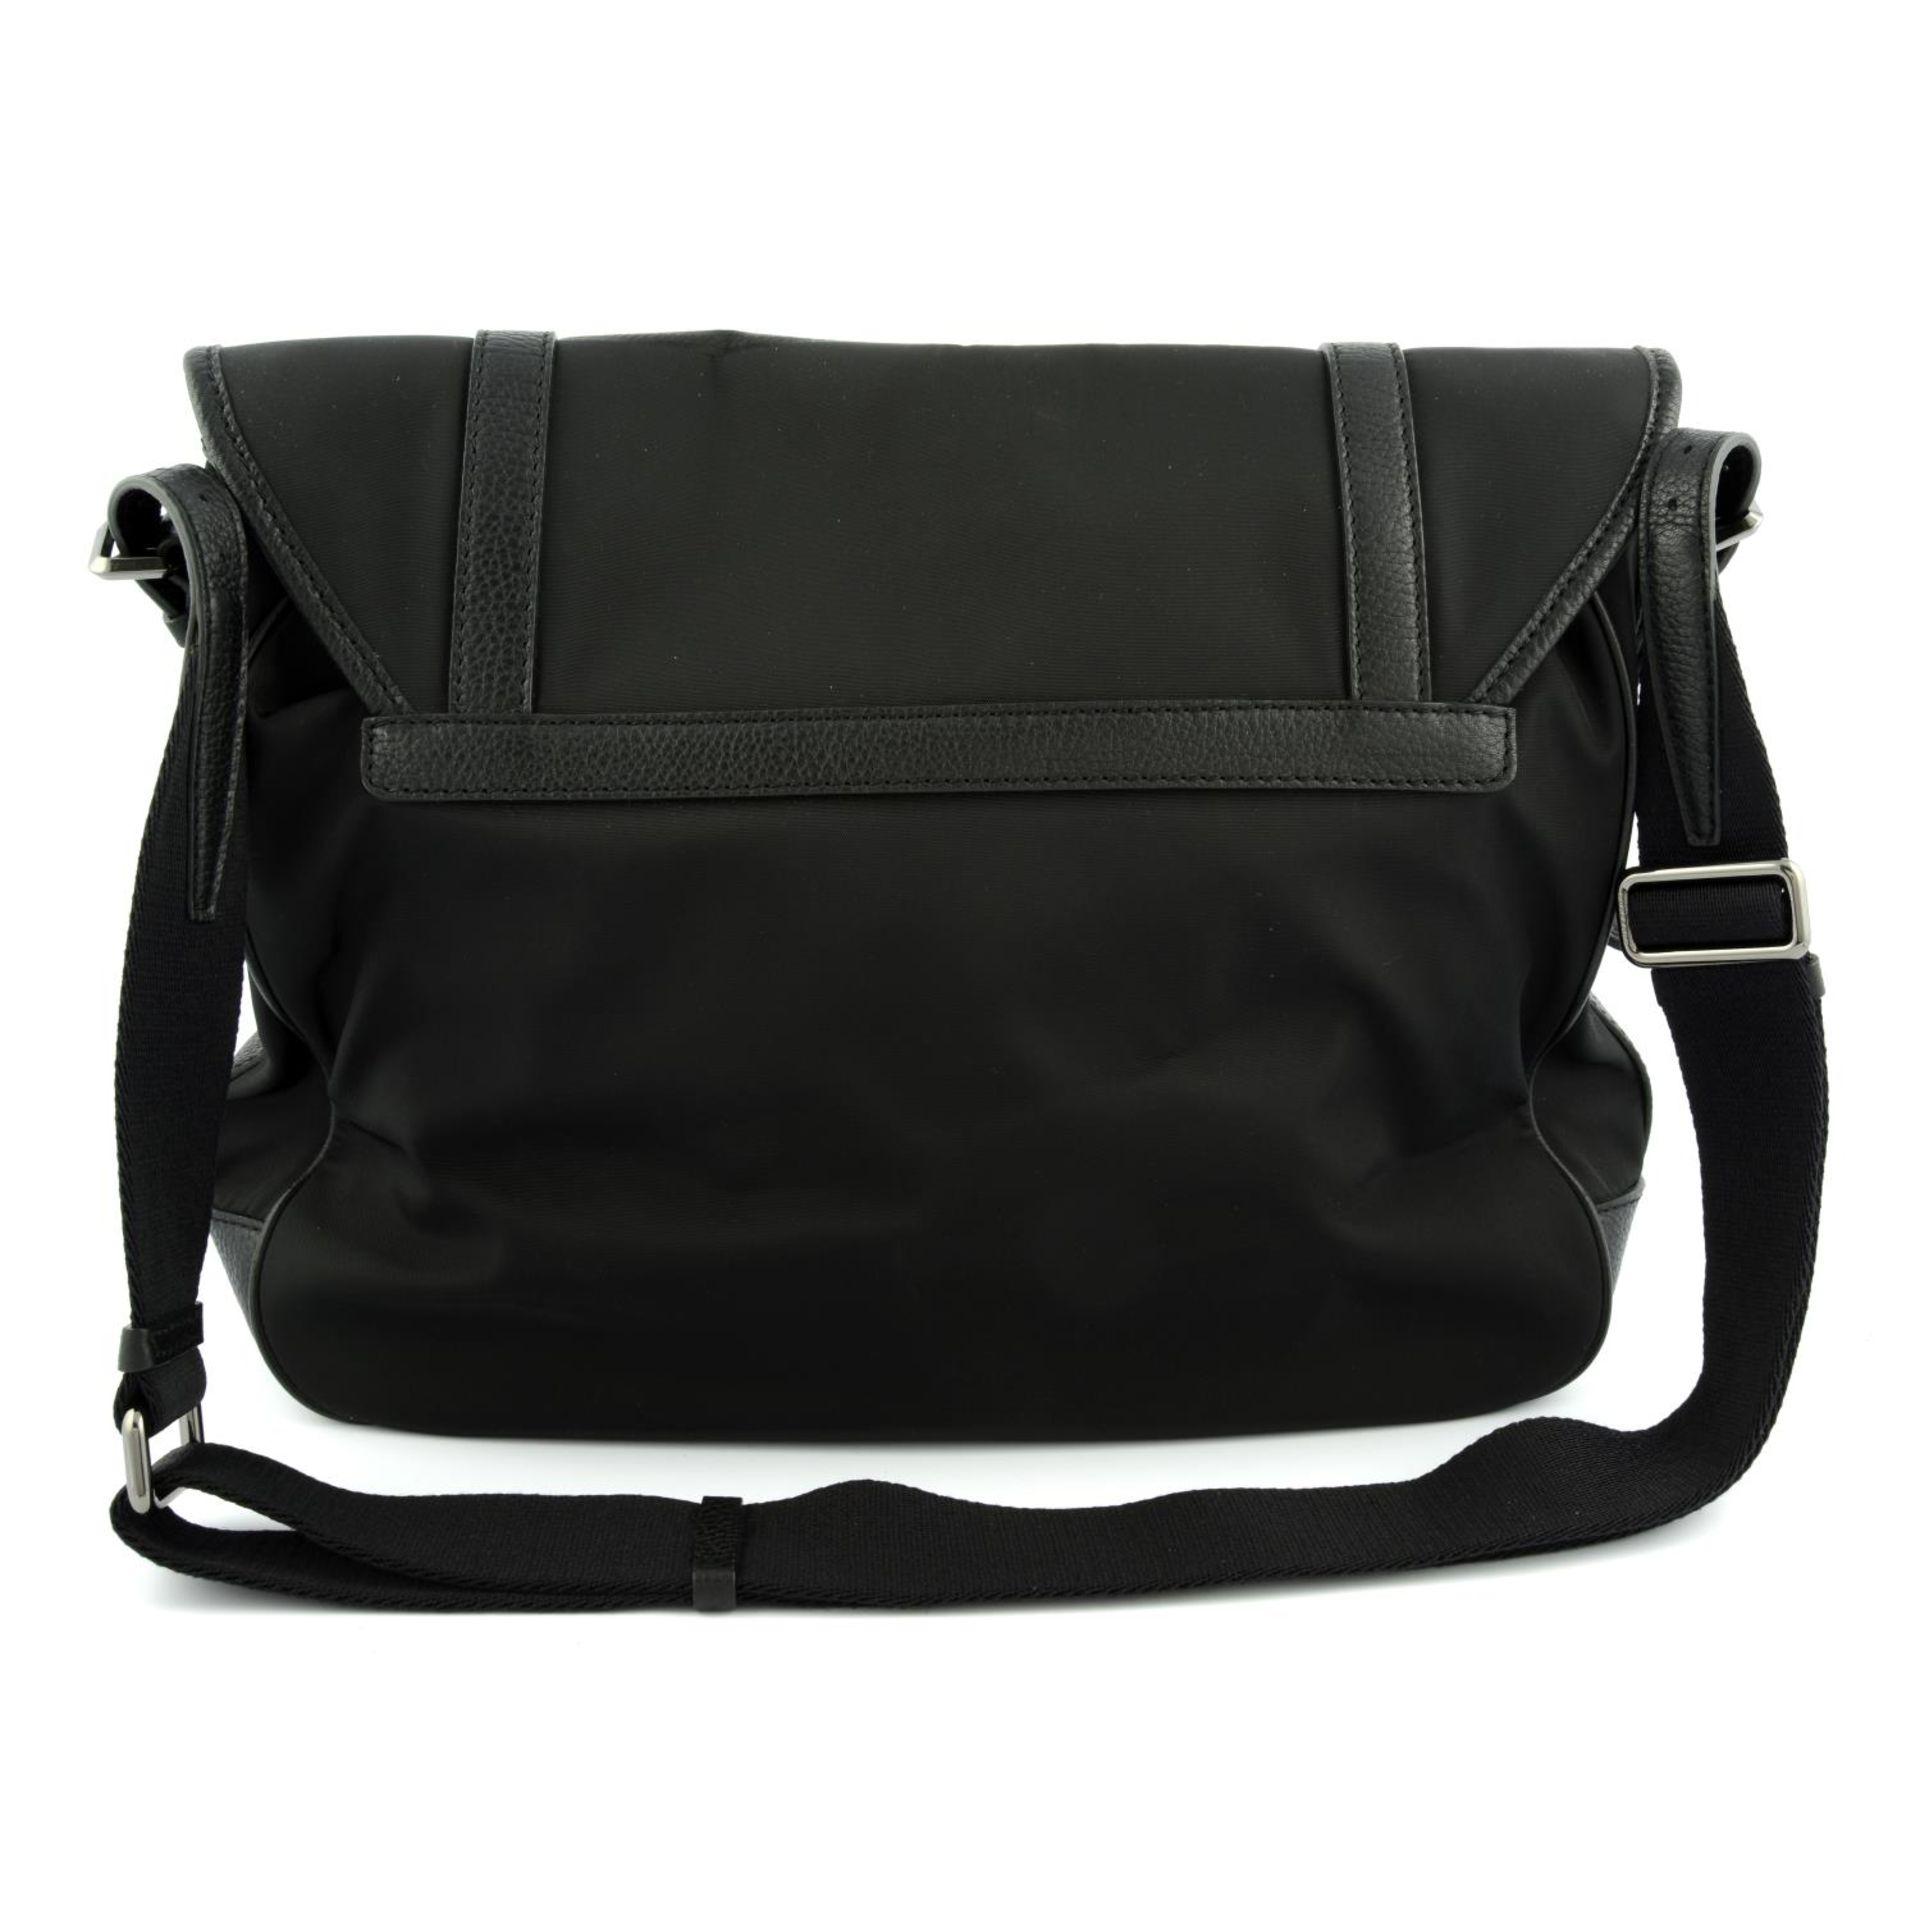 BURBERRY - a nylon messenger satchel. - Image 3 of 5